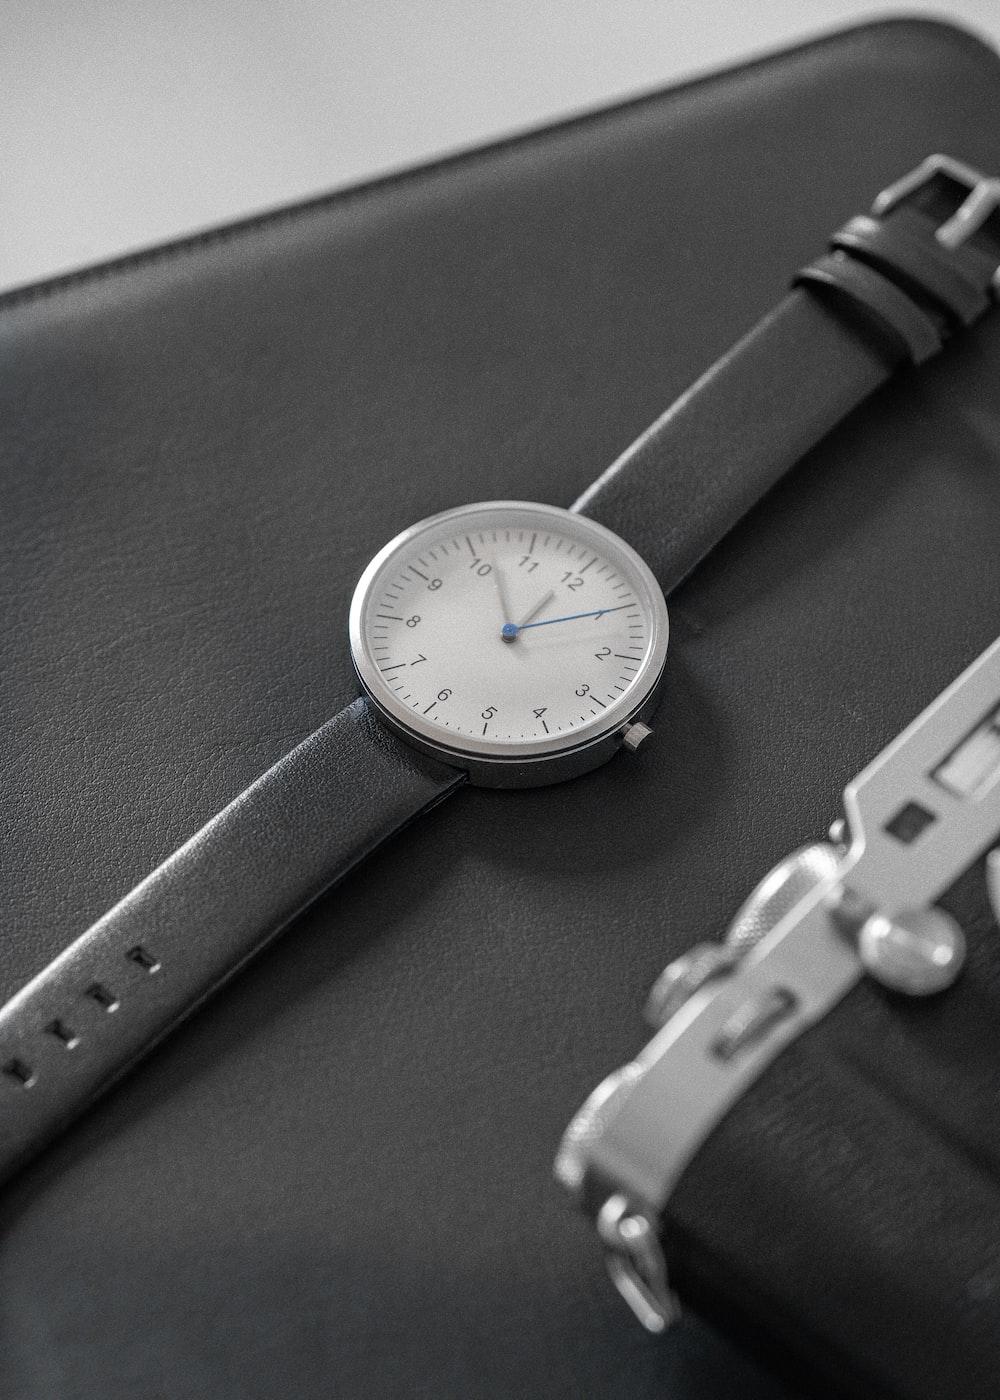 analog watch at 11:51